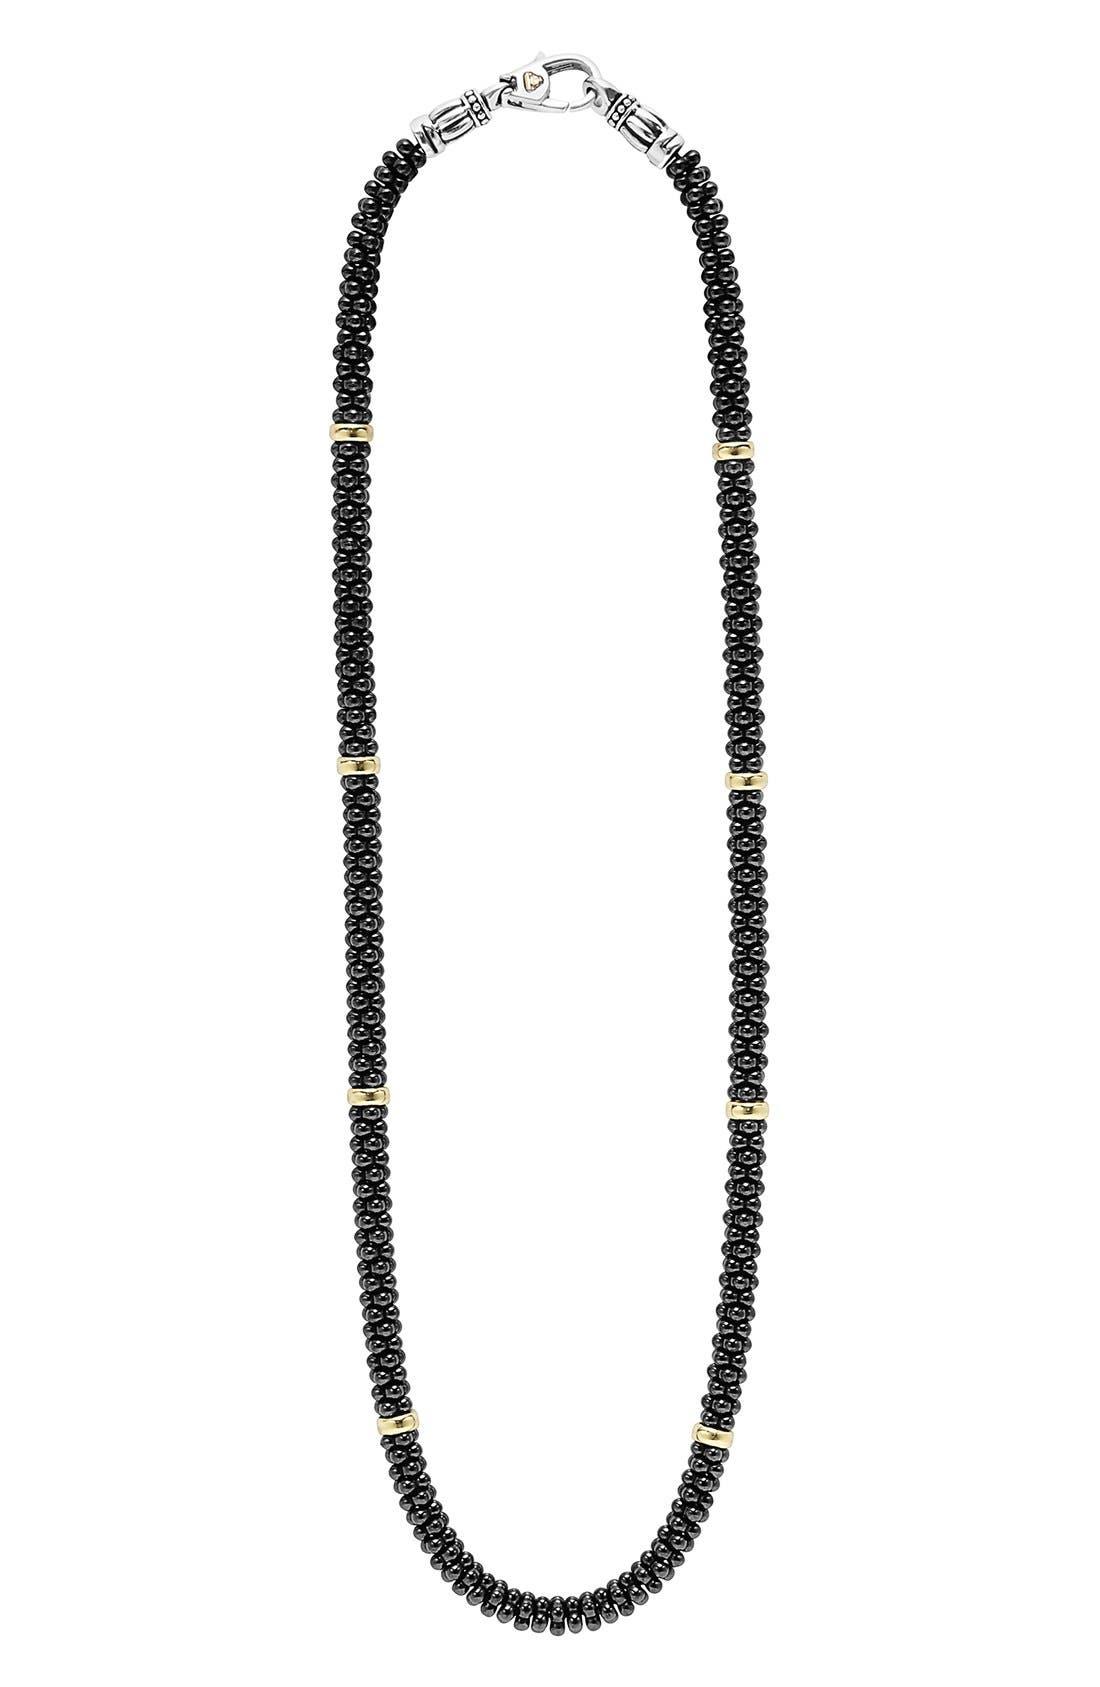 LAGOS 'Black Caviar' Station Rope Necklace